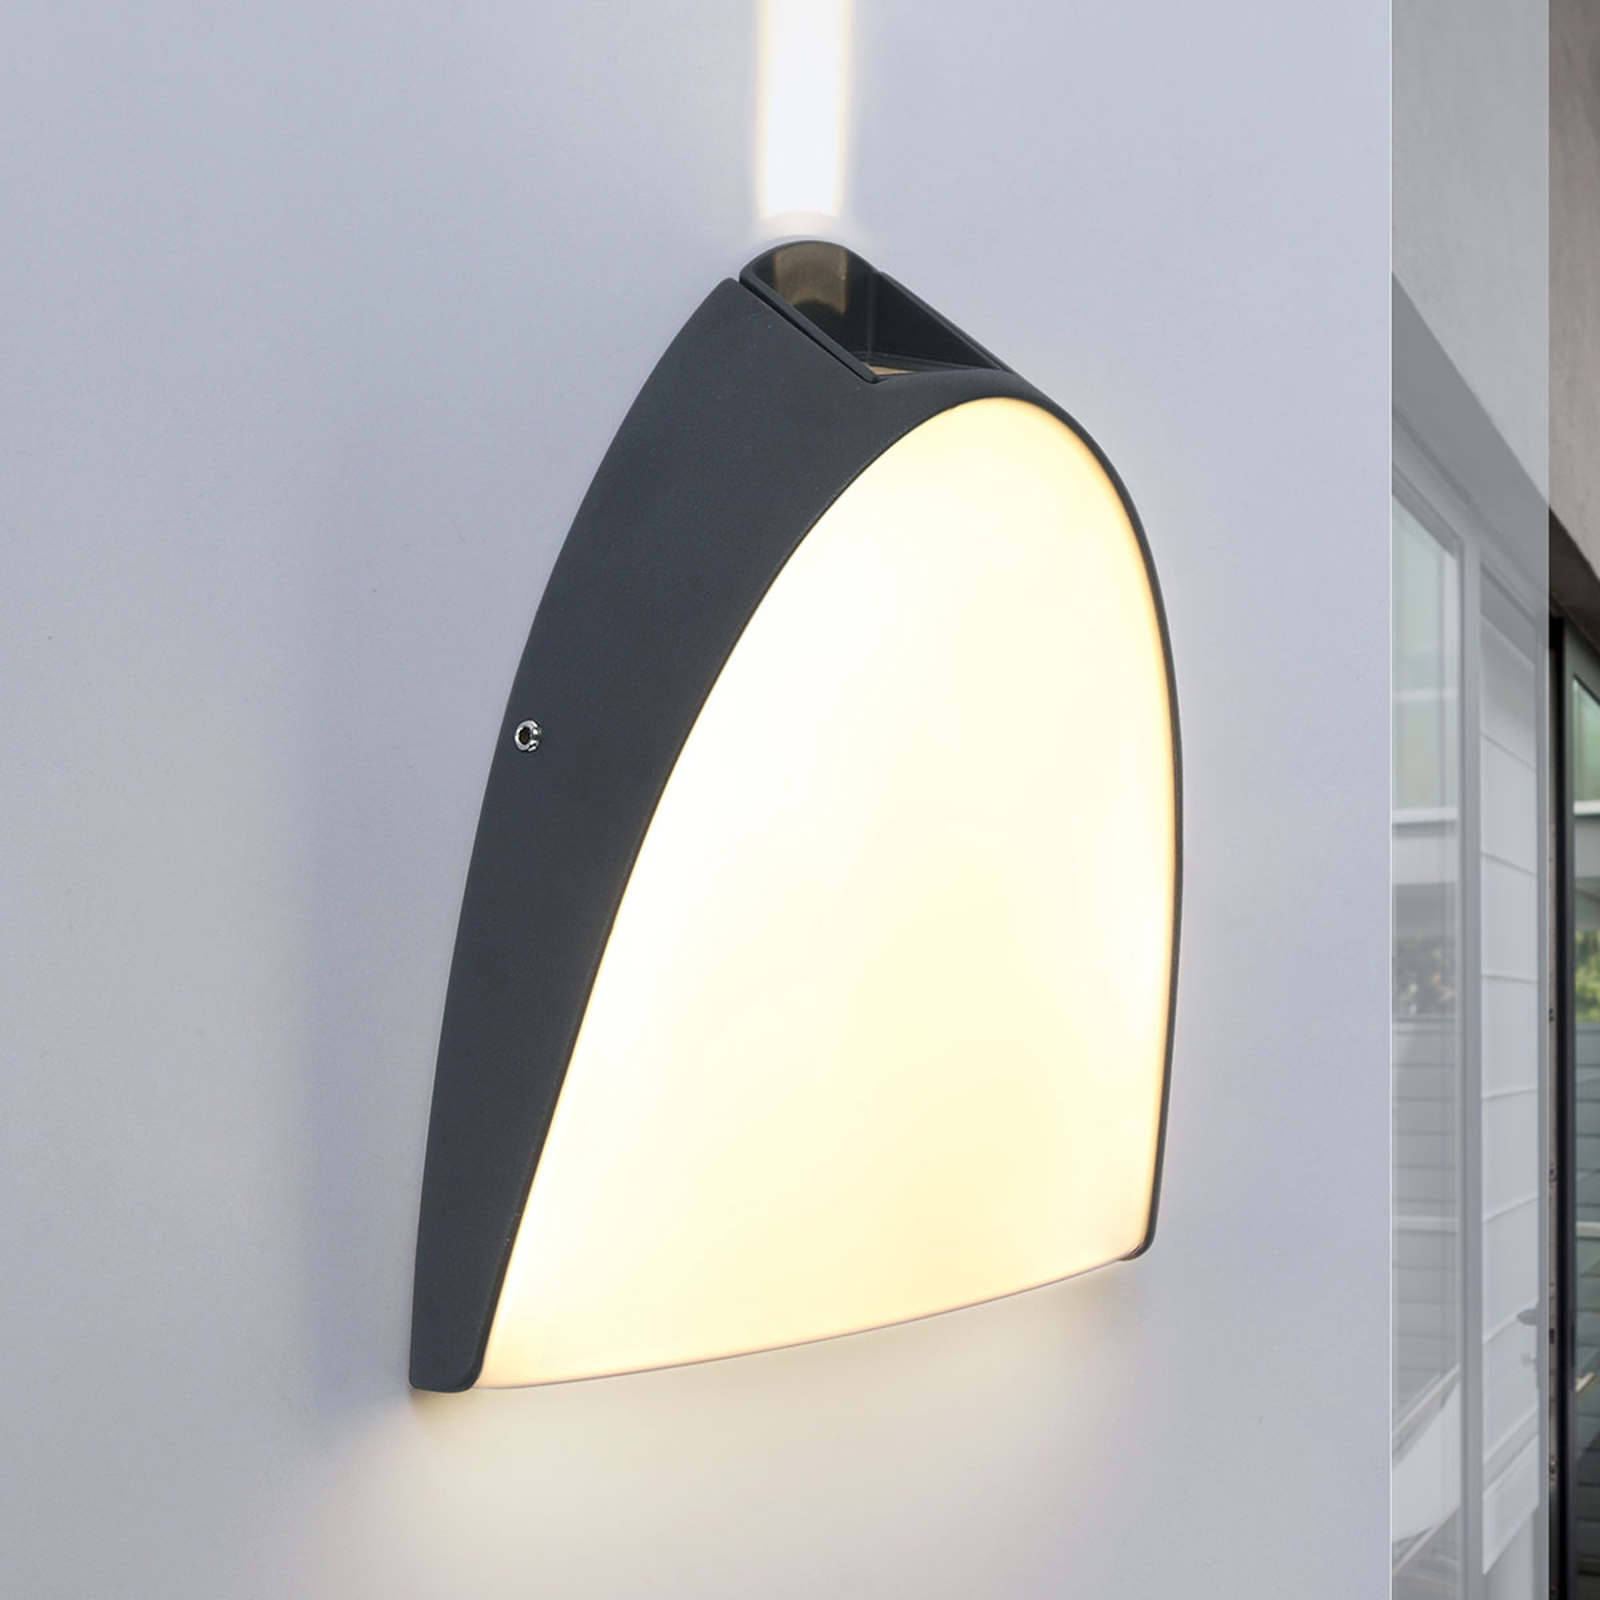 Apollo - LED buitenwandlamp met effectlicht boven